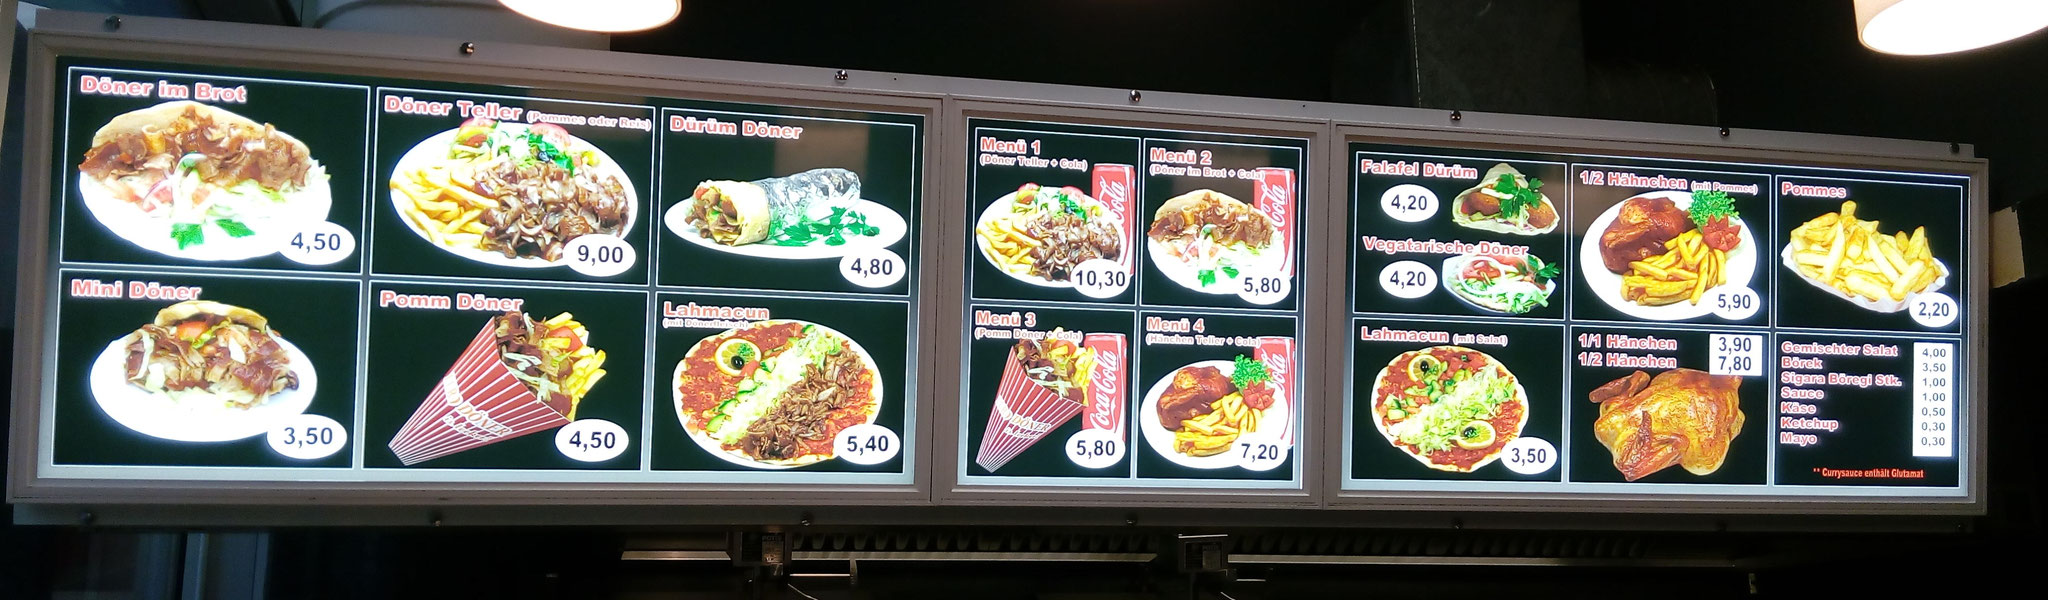 Leuchtkasten / Menü-Board